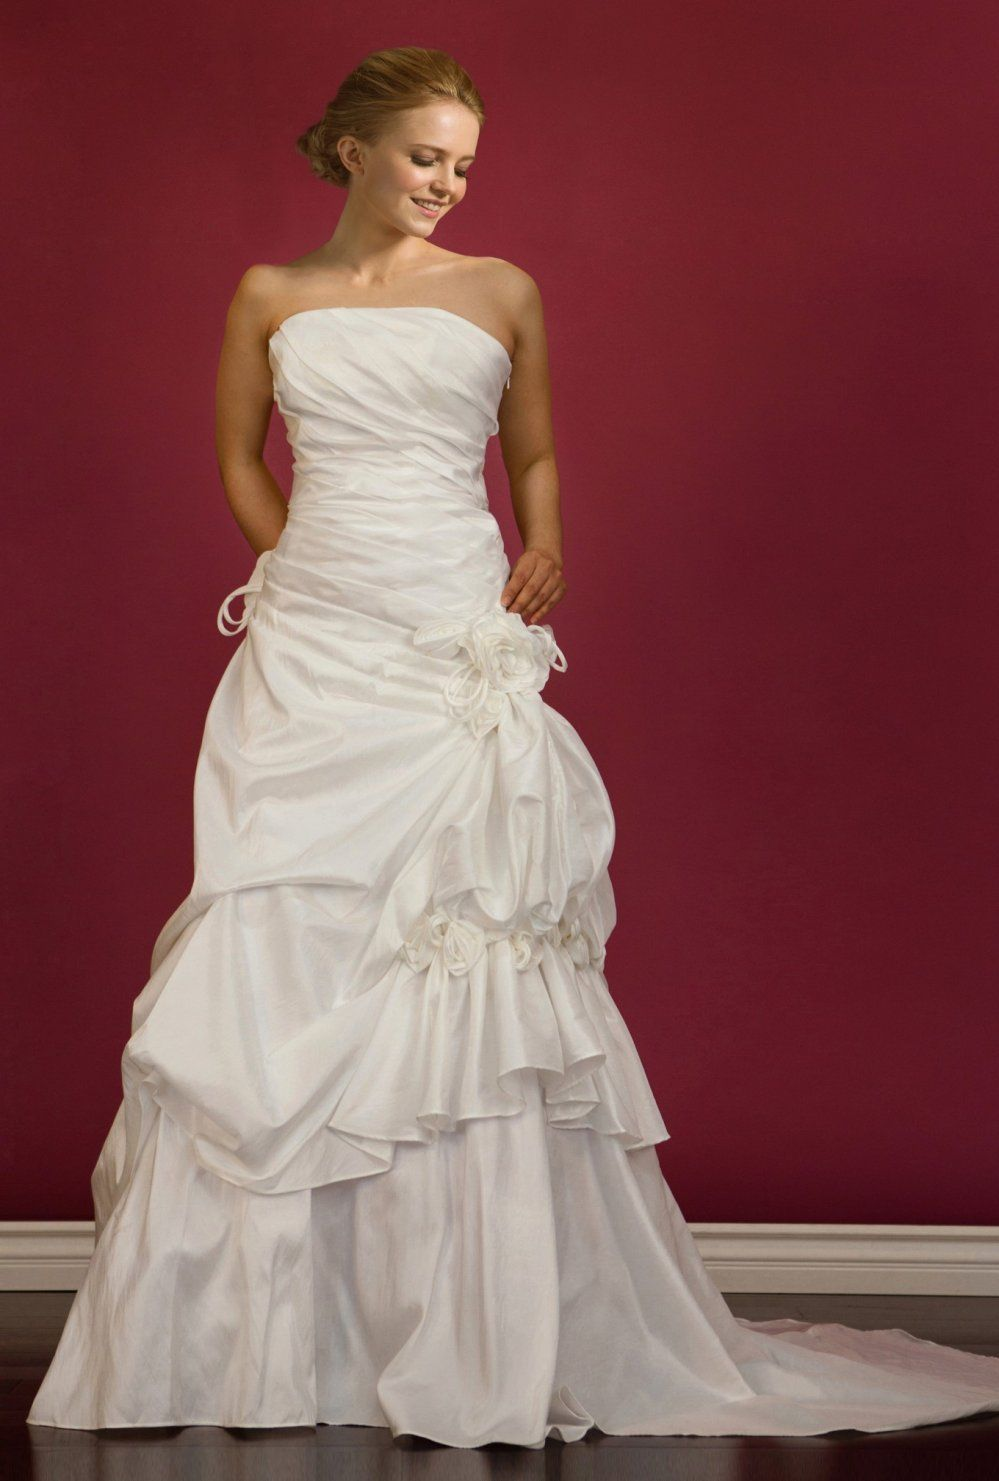 49+ Tiered wedding dress with straps ideas